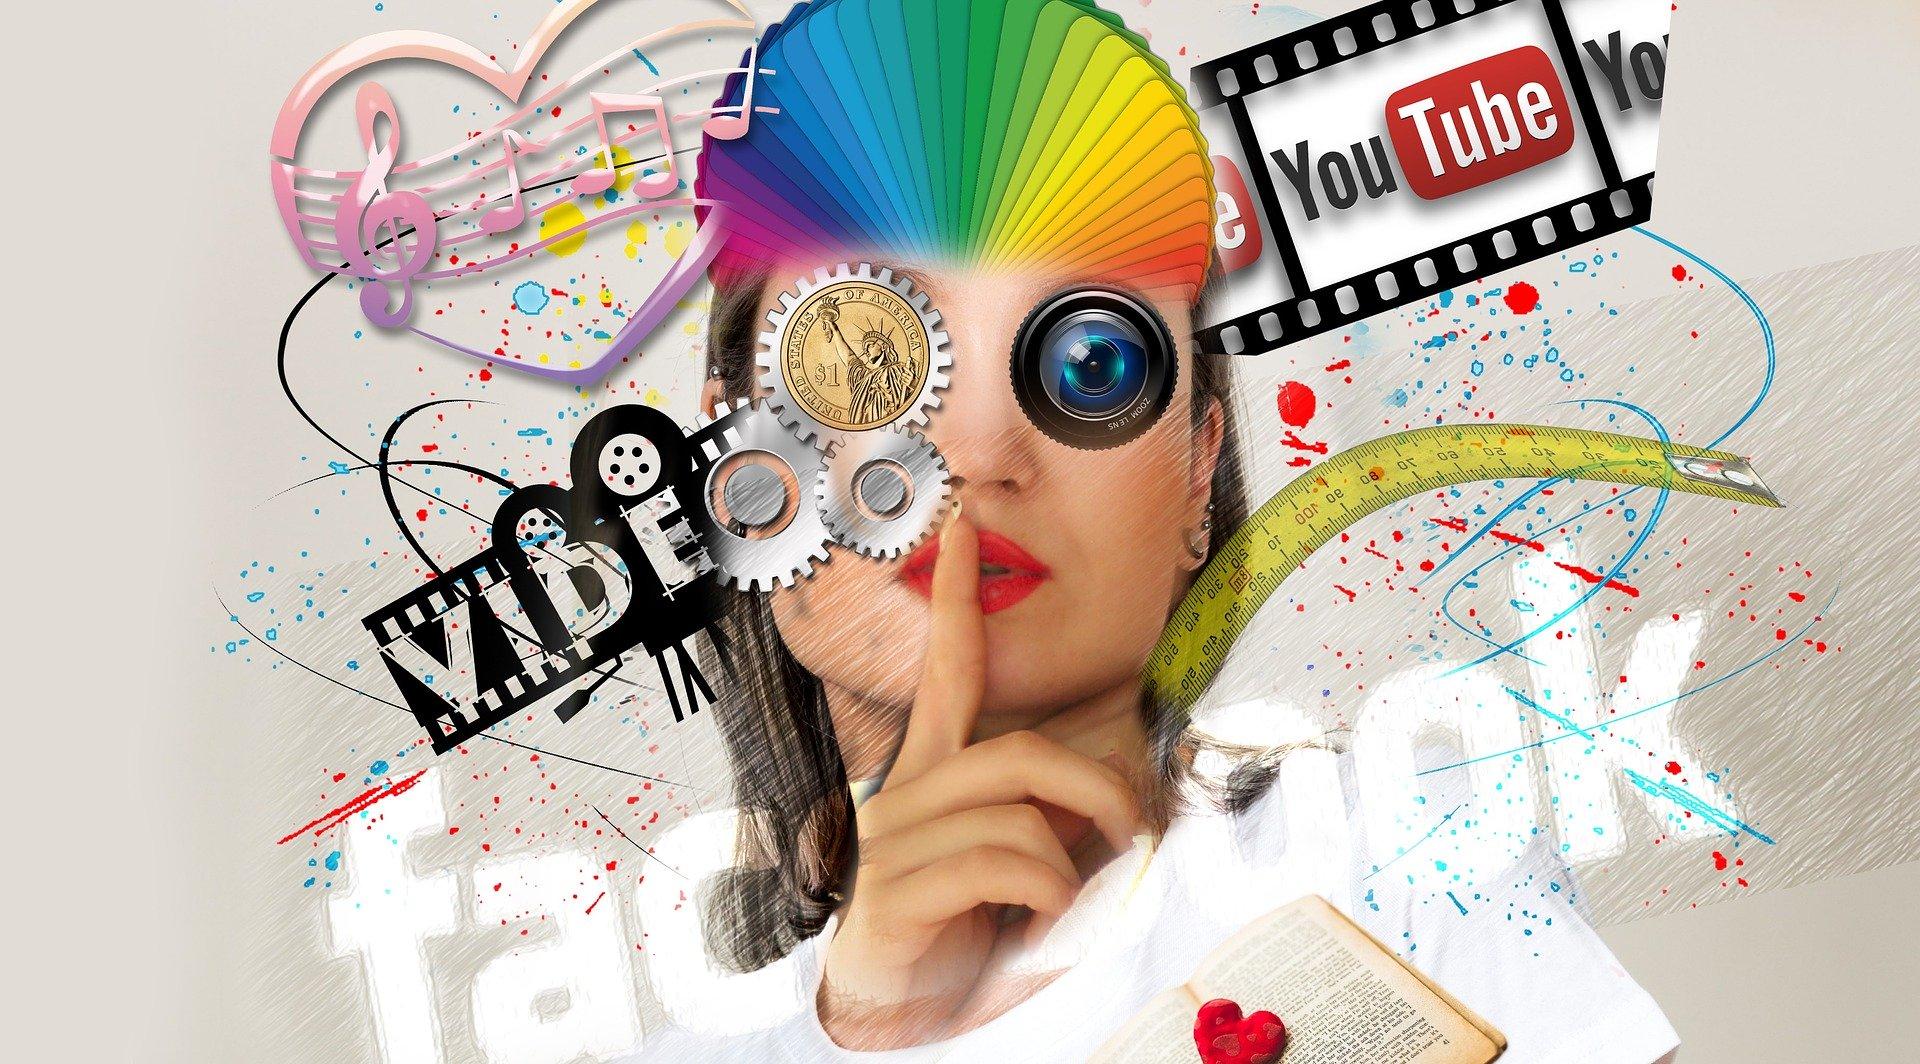 woman with social media logos